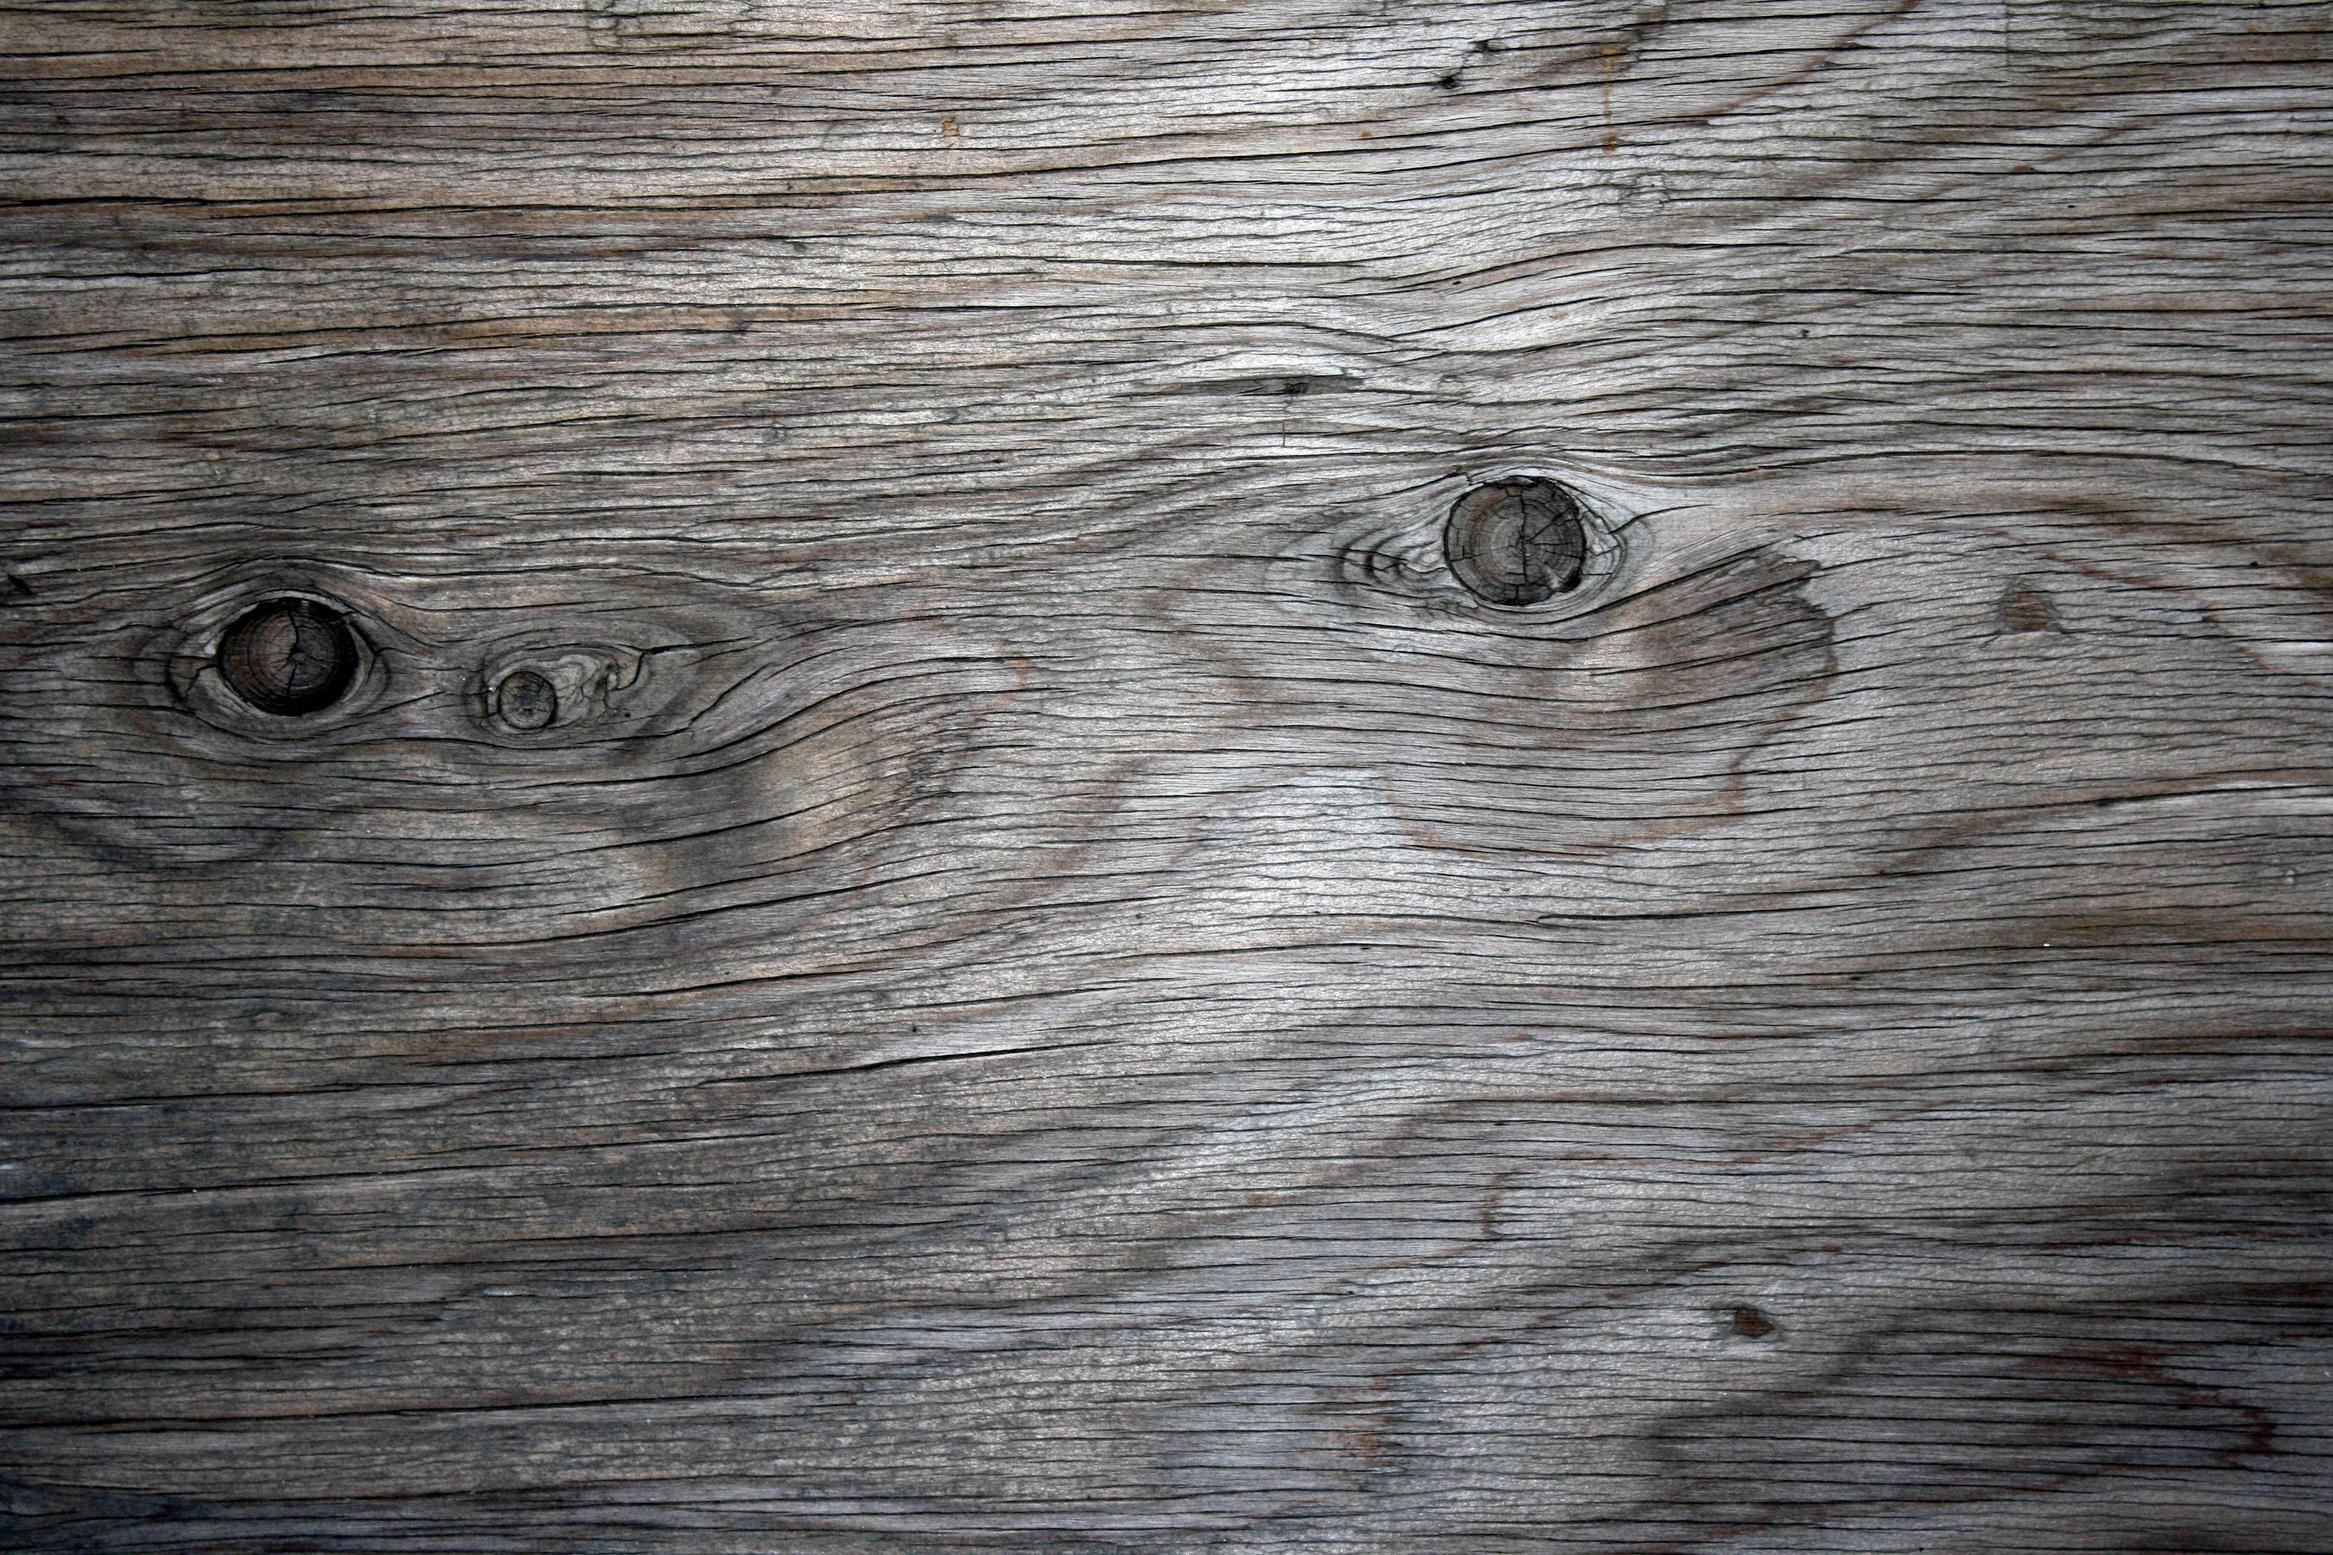 wood grain wallpapers hd wallpaper cave